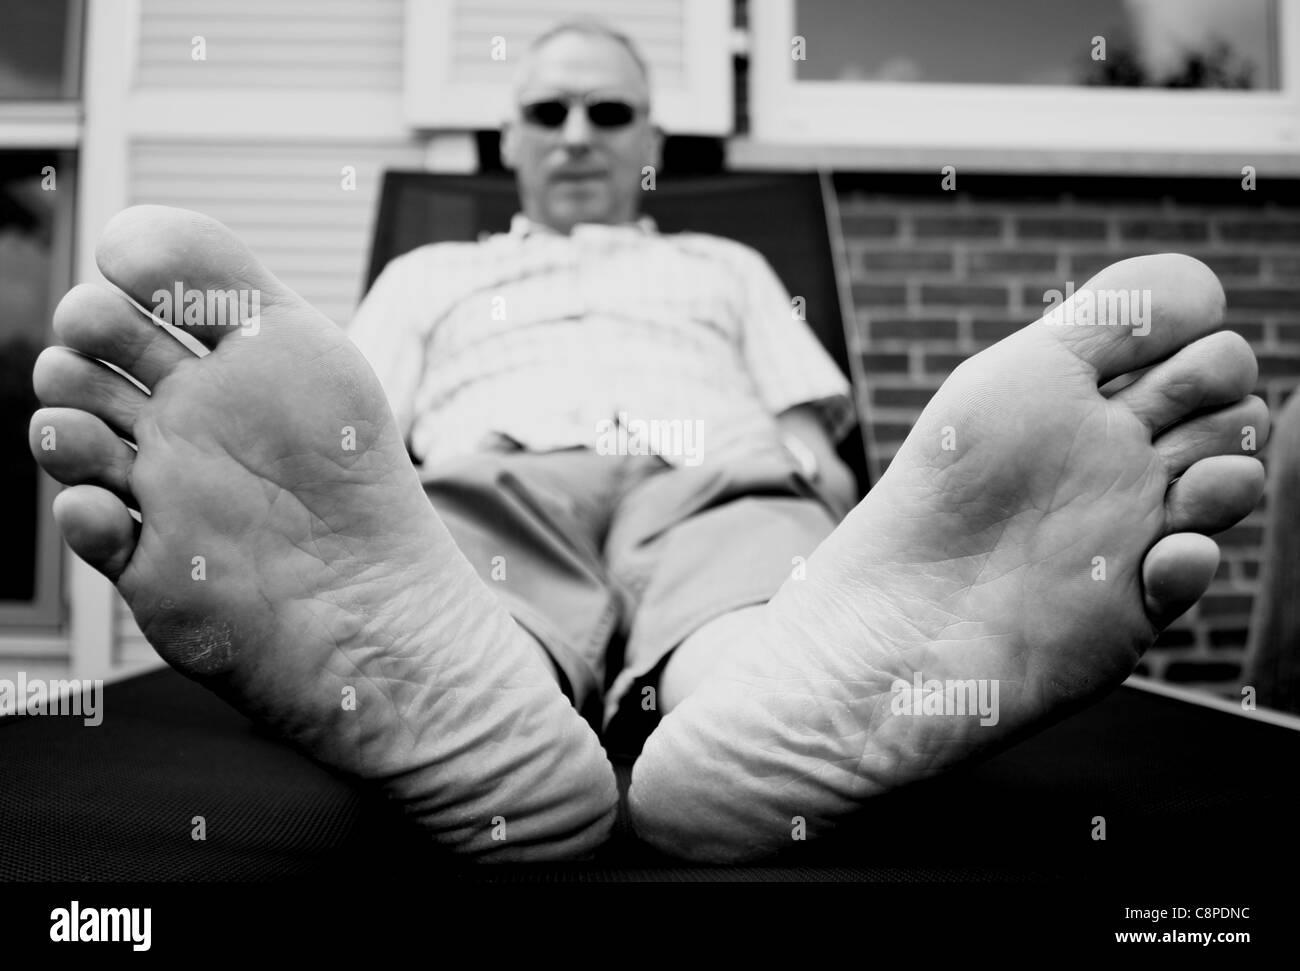 [Image: man-lying-down-in-chair-focus-on-feet-C8PDNC.jpg]